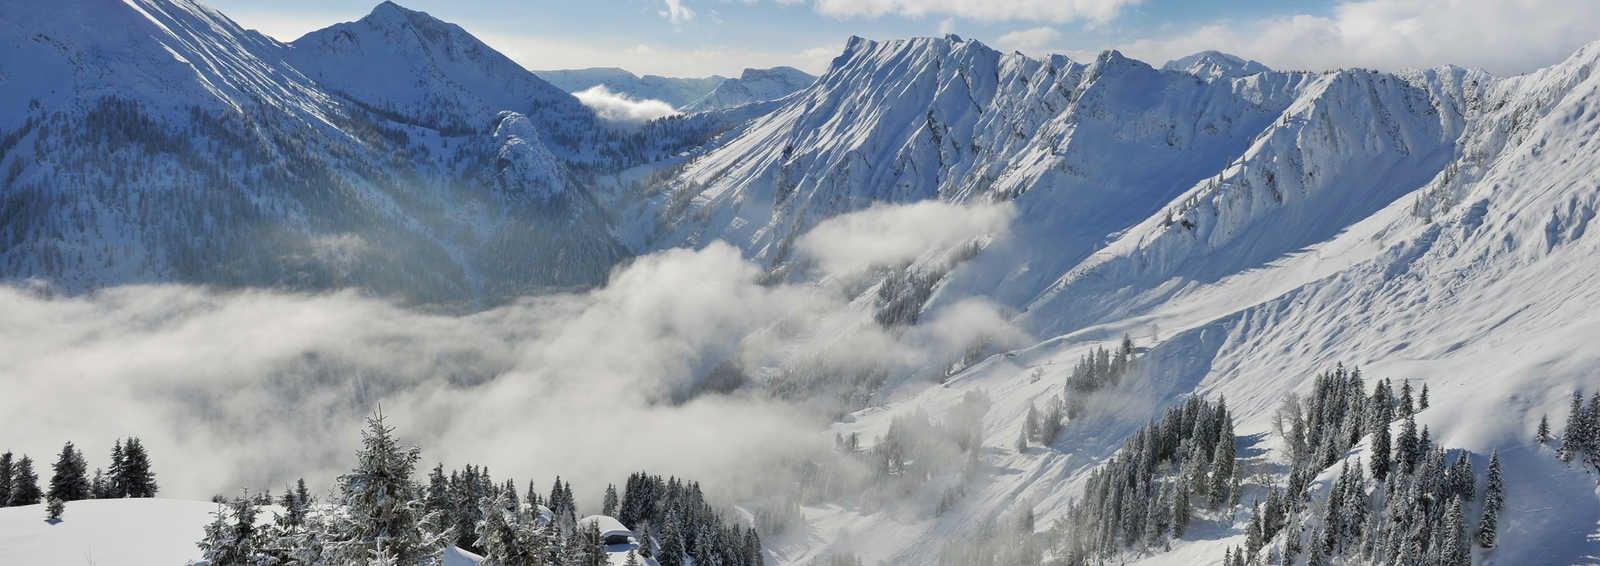 Glorious sunshine over the Austrian Tyrol